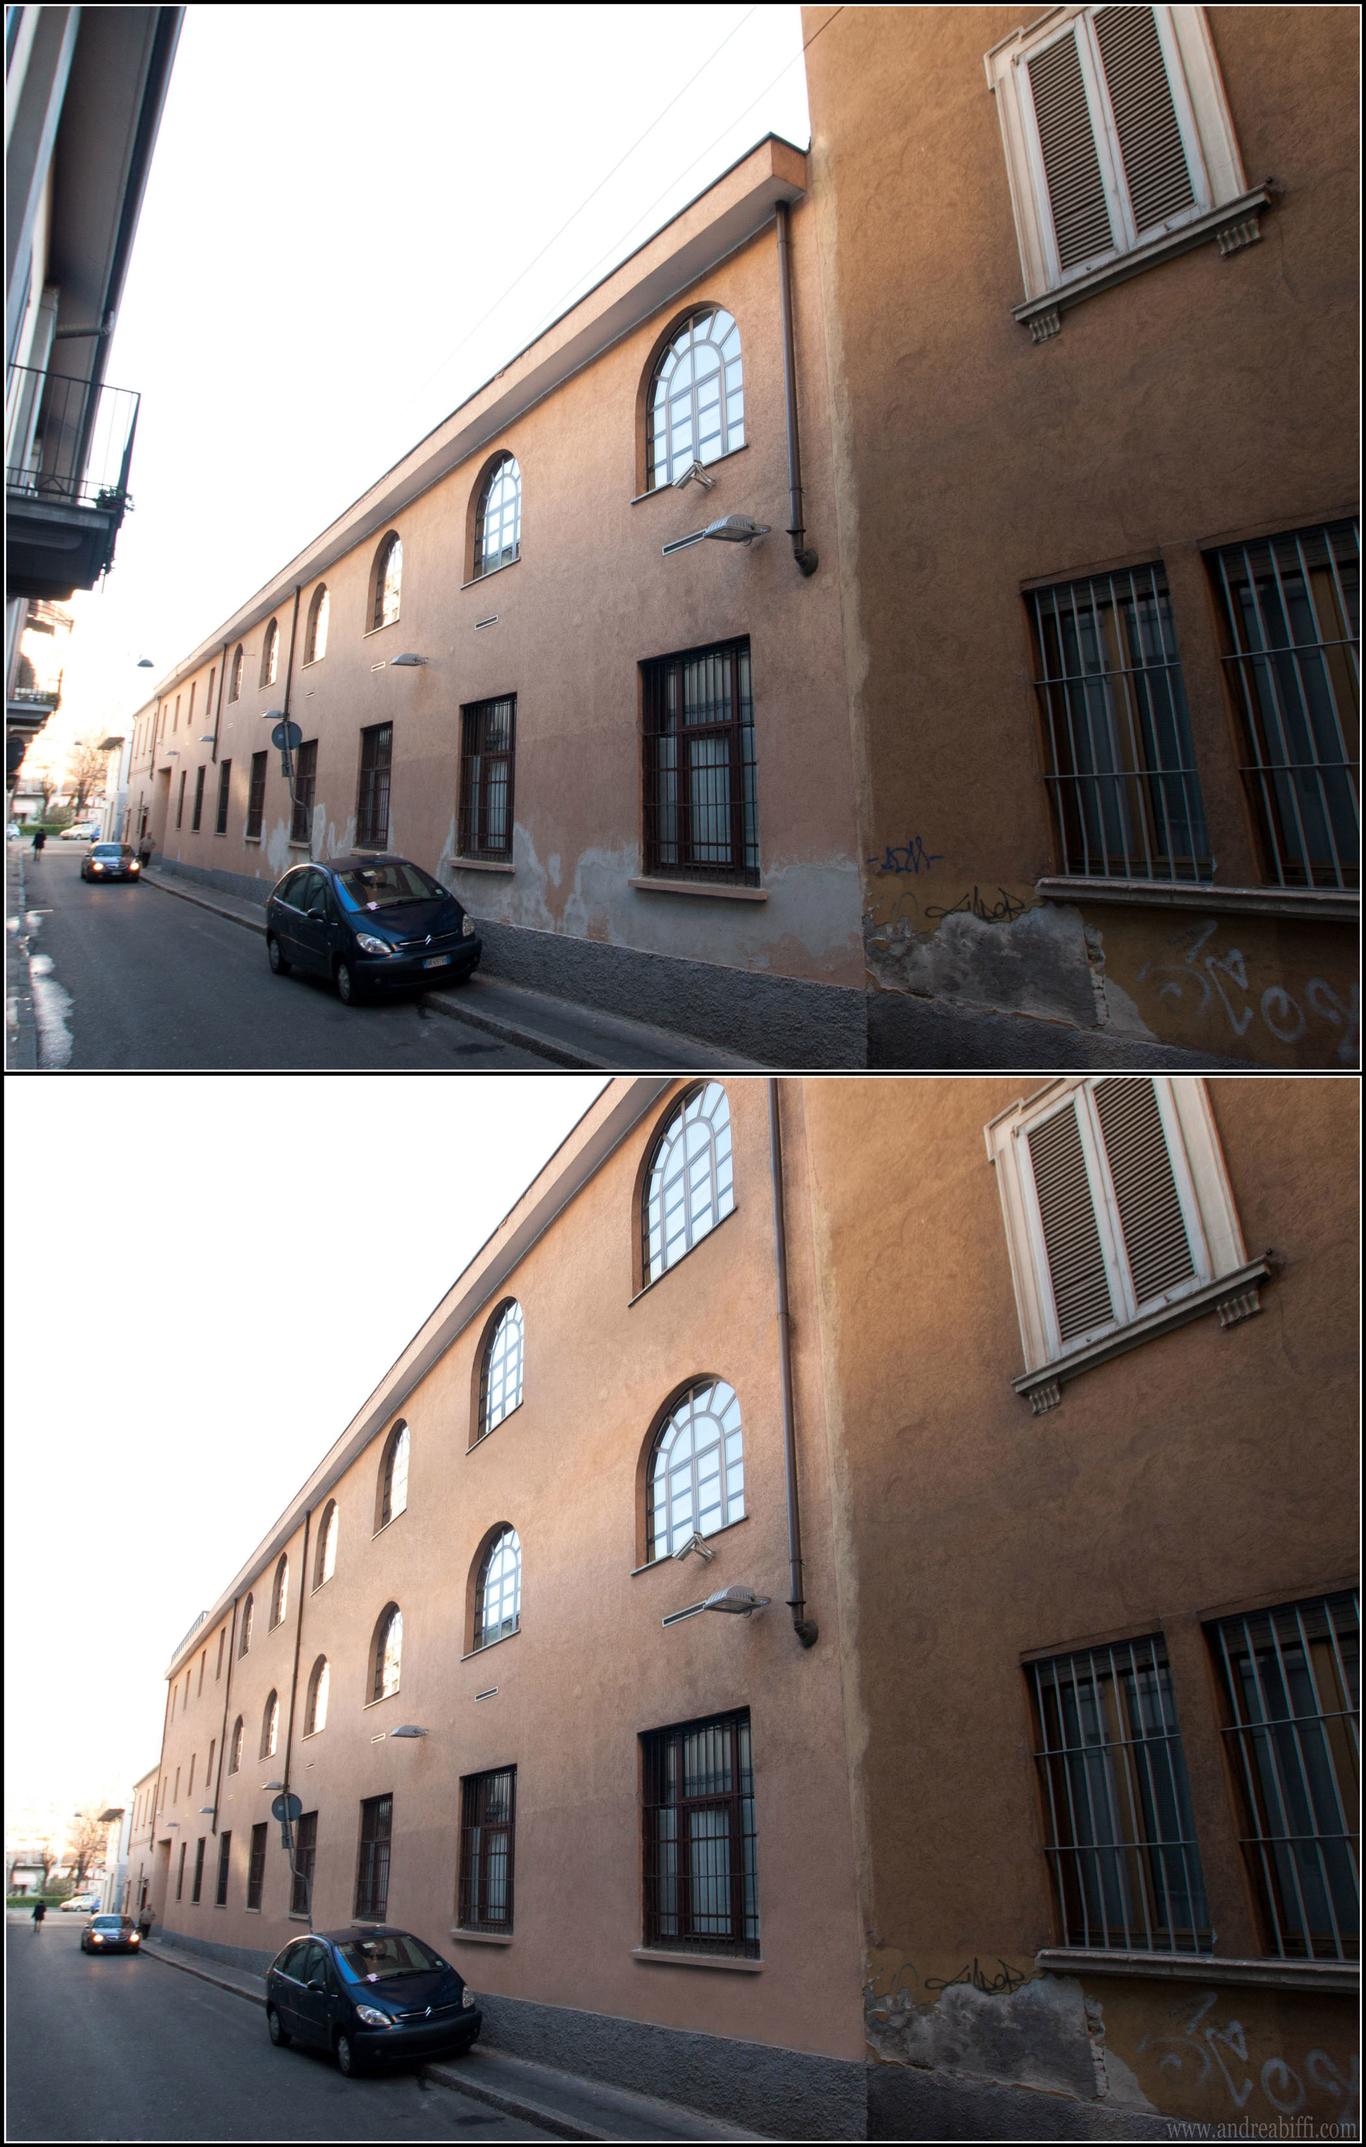 Deda photorealistic urban 1 19b2dc7e rvcw